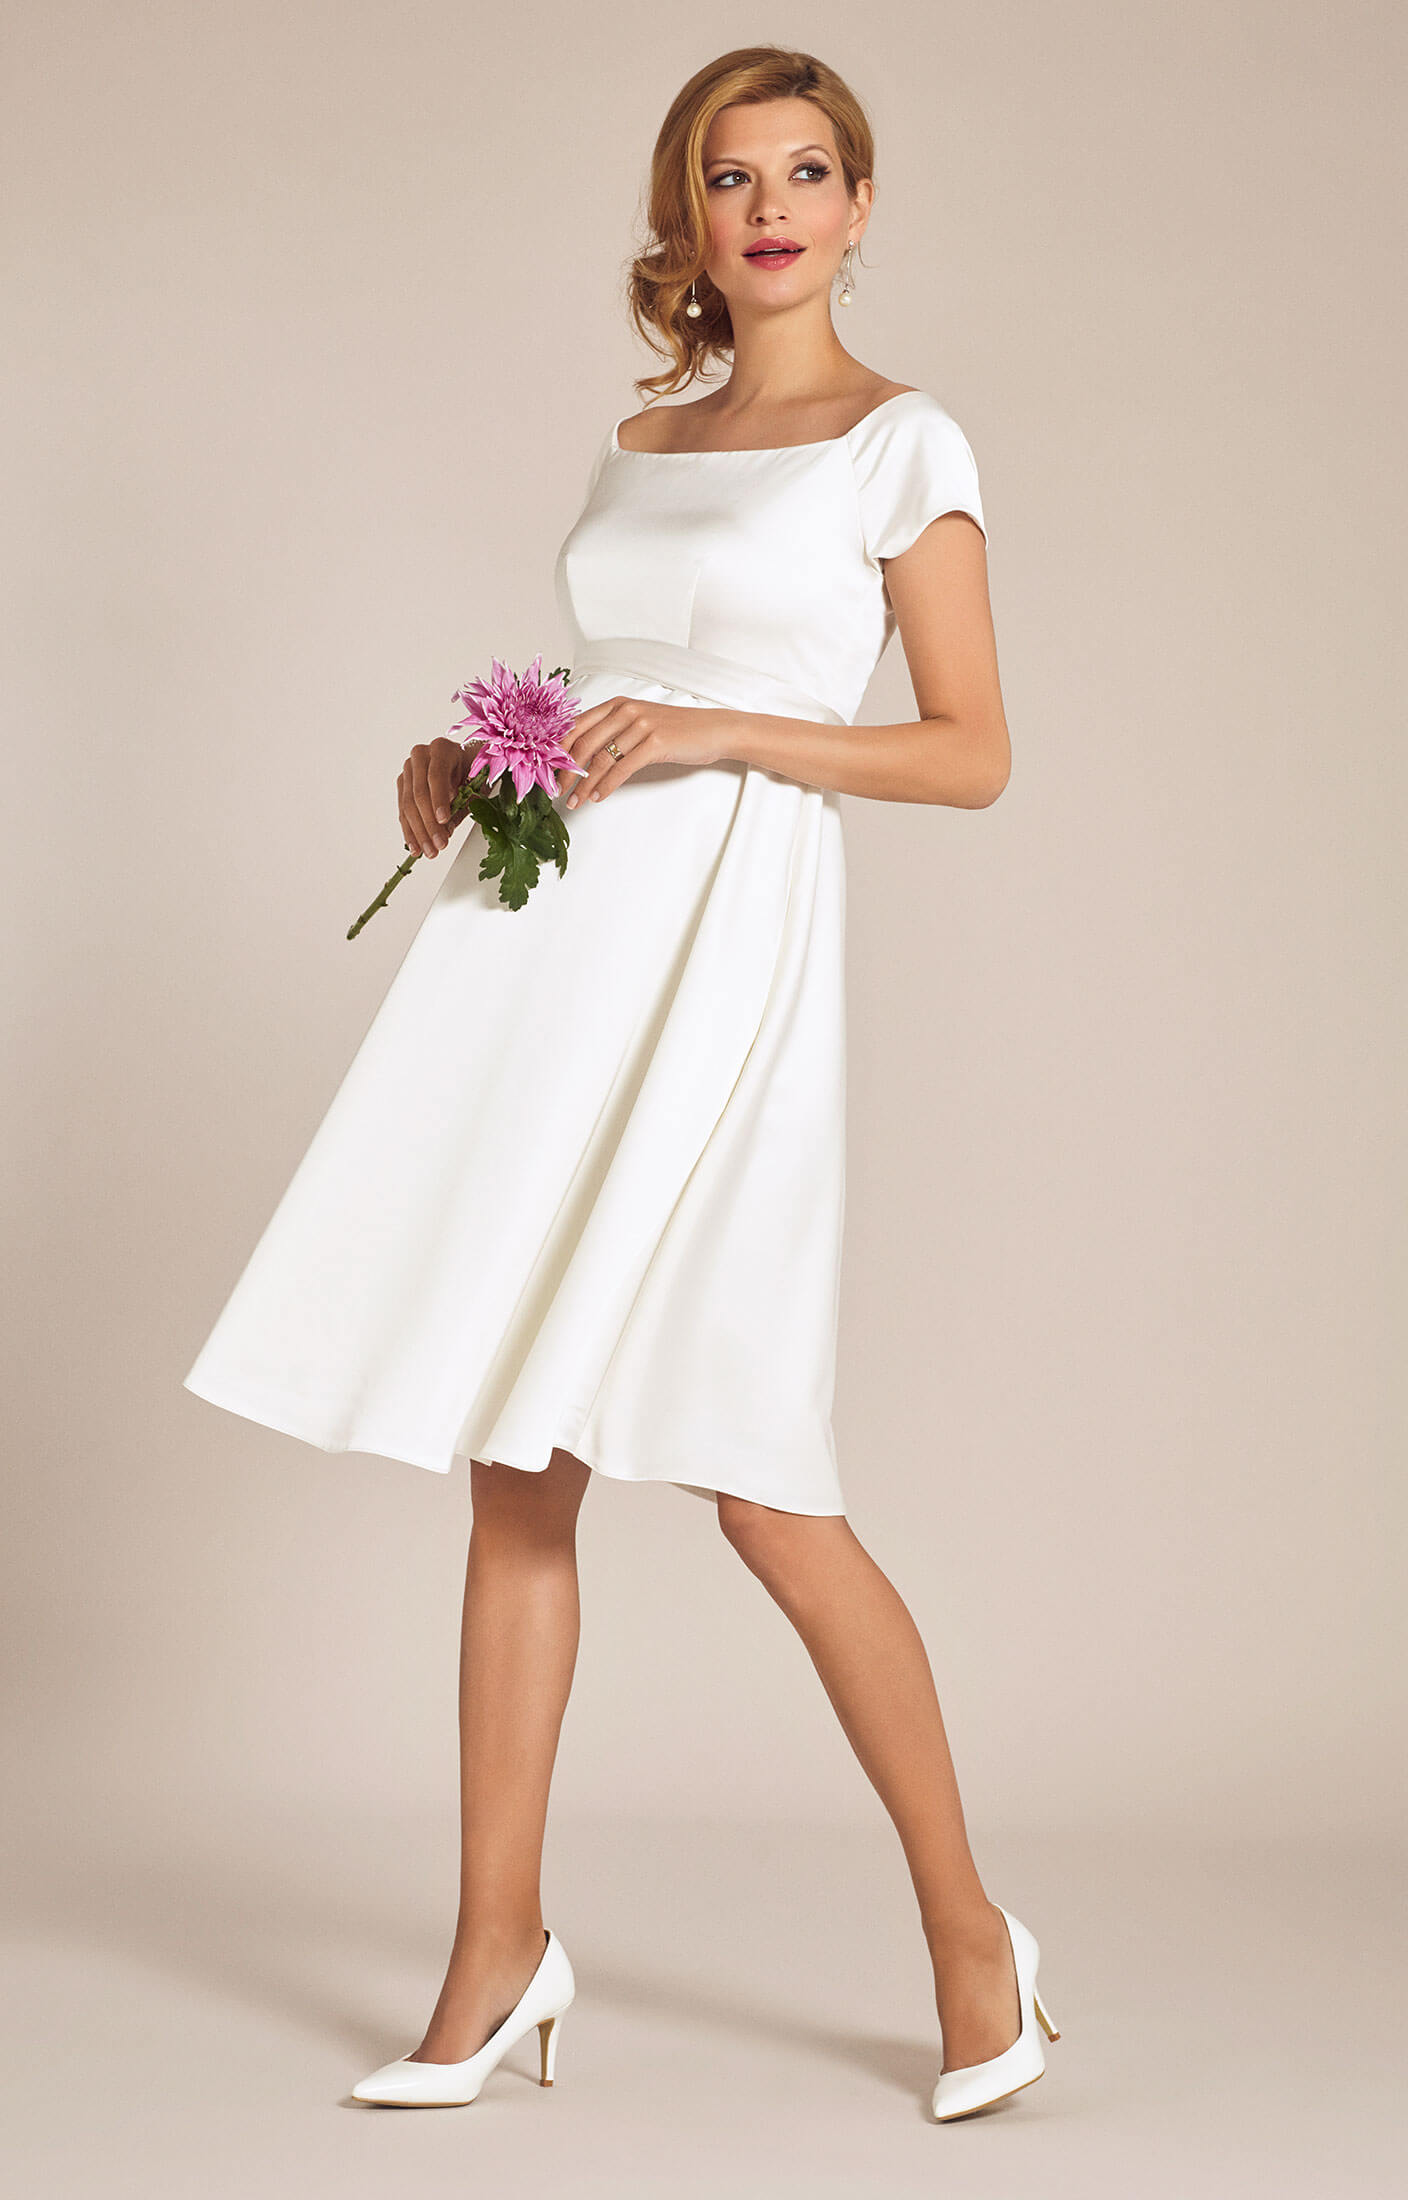 Aria maternity wedding dress ivory maternity wedding for Maternity dresses for wedding party